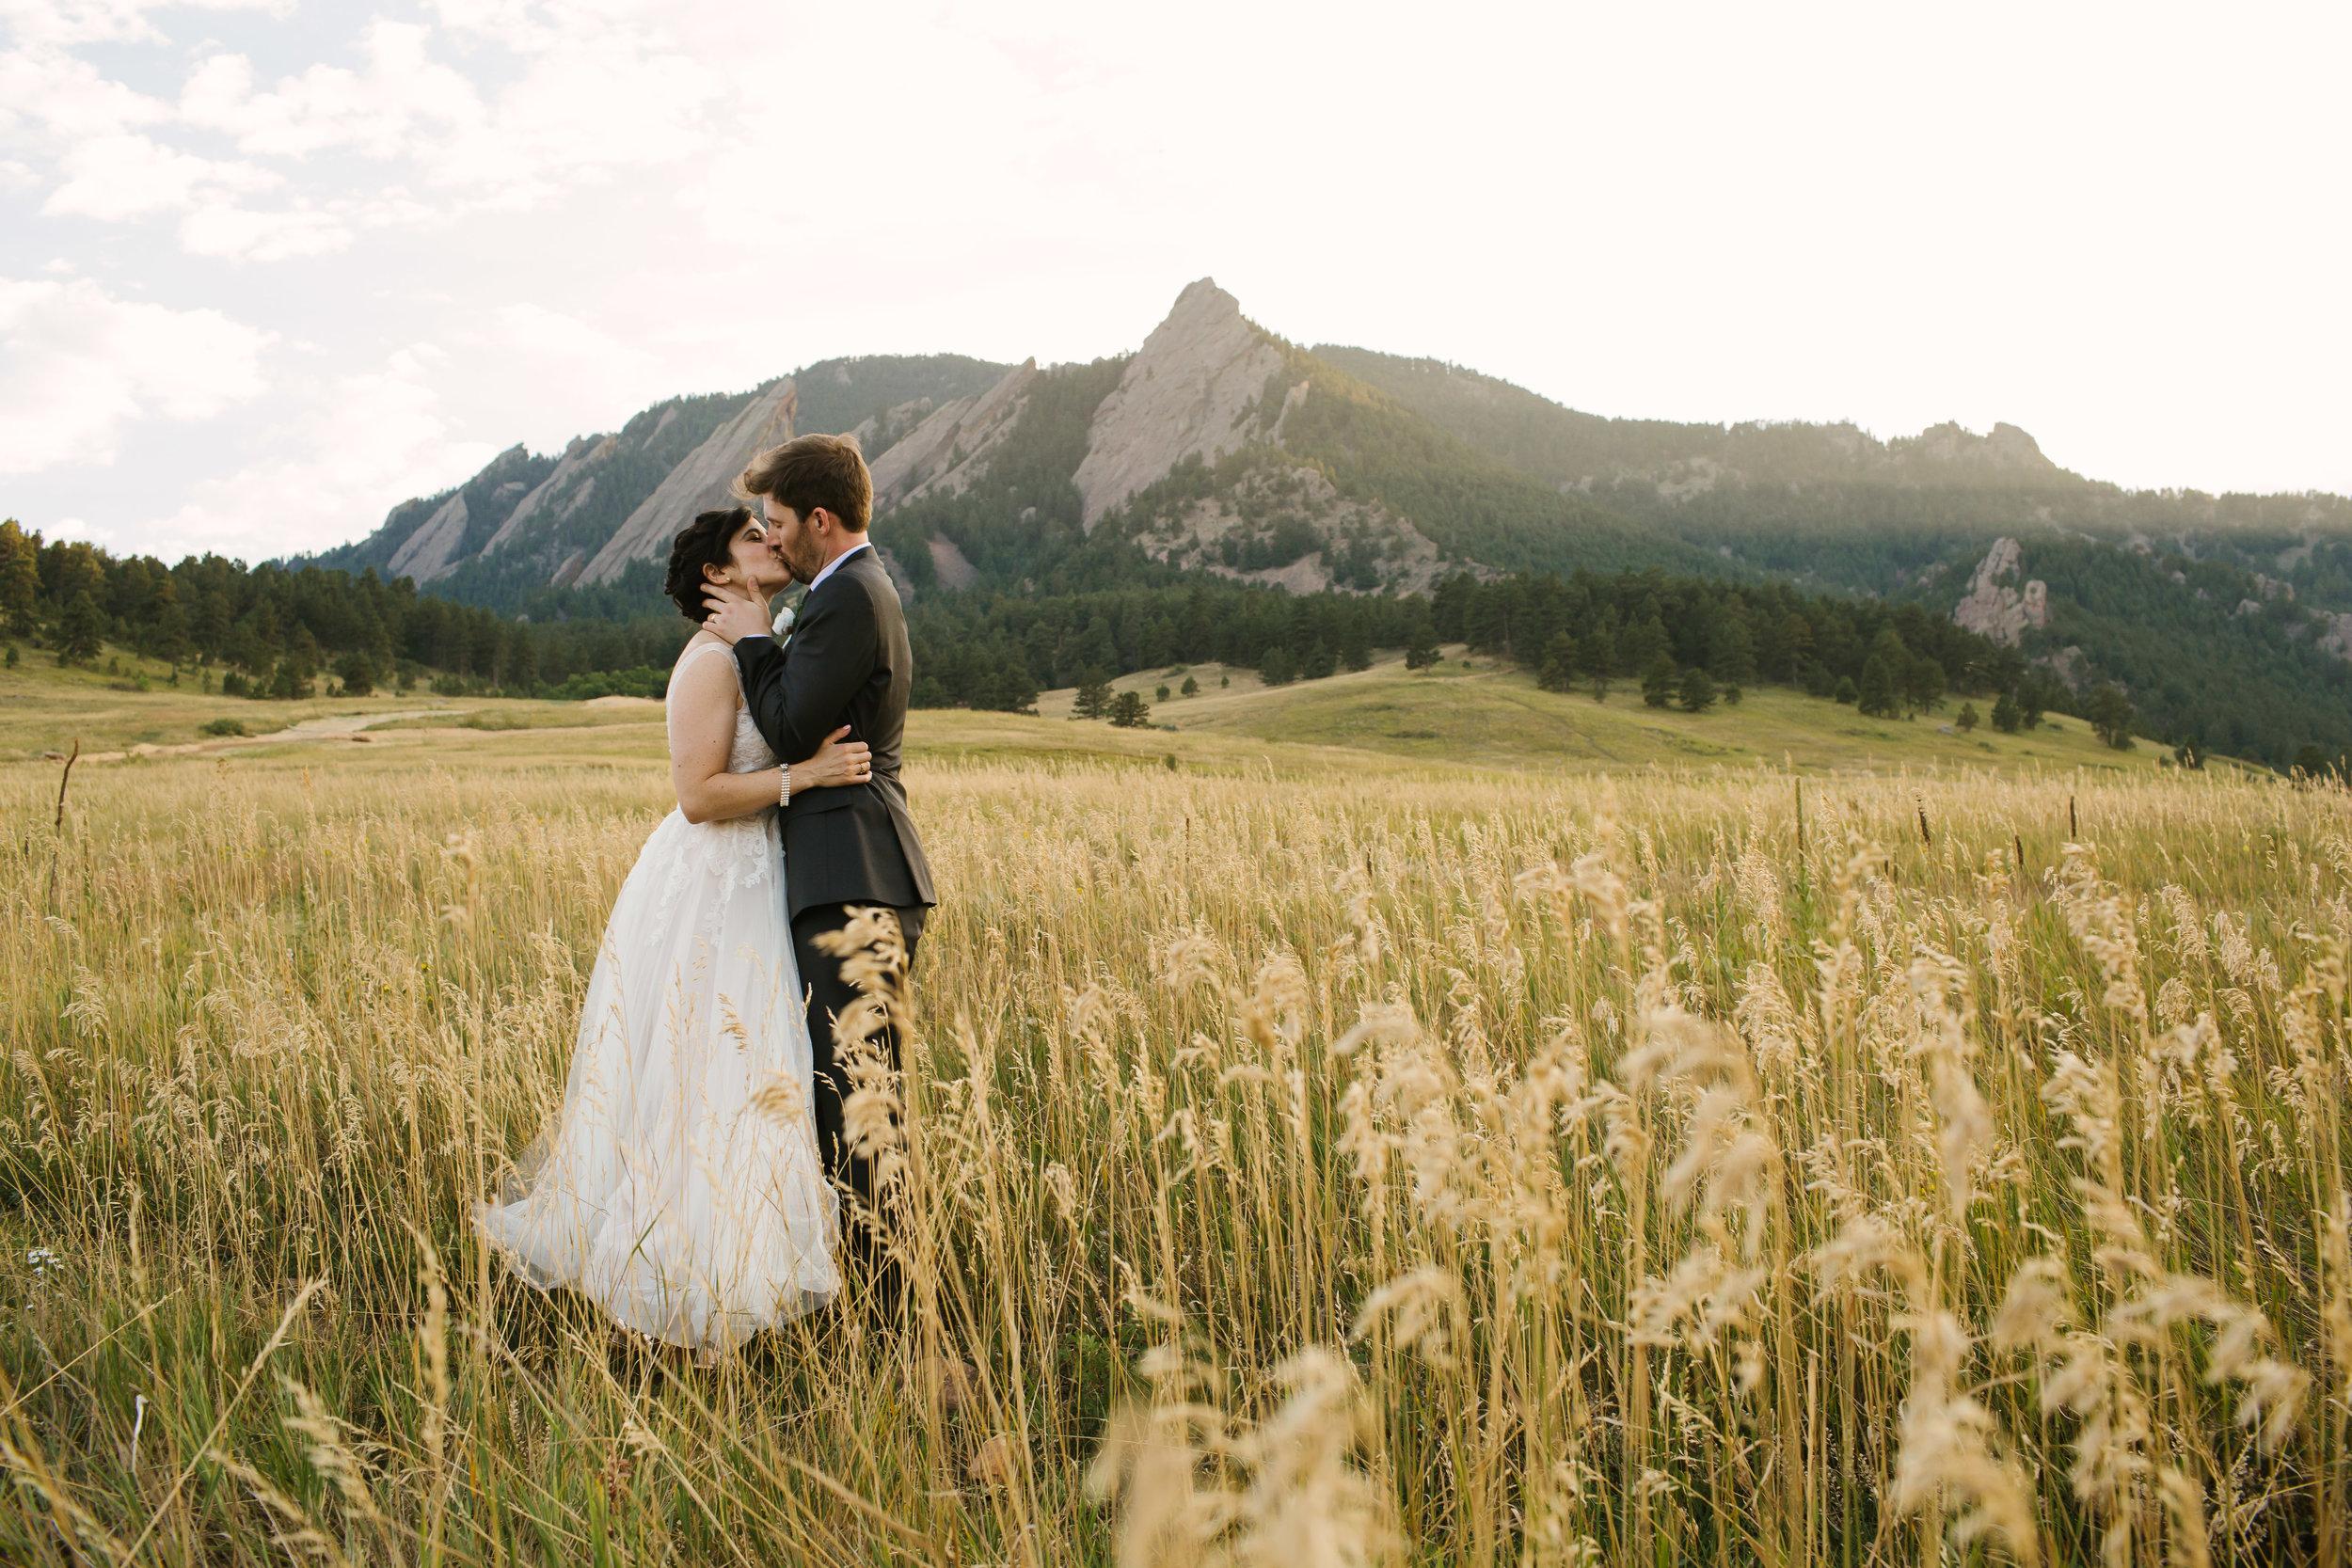 Chautauqua Park Bride and Groom